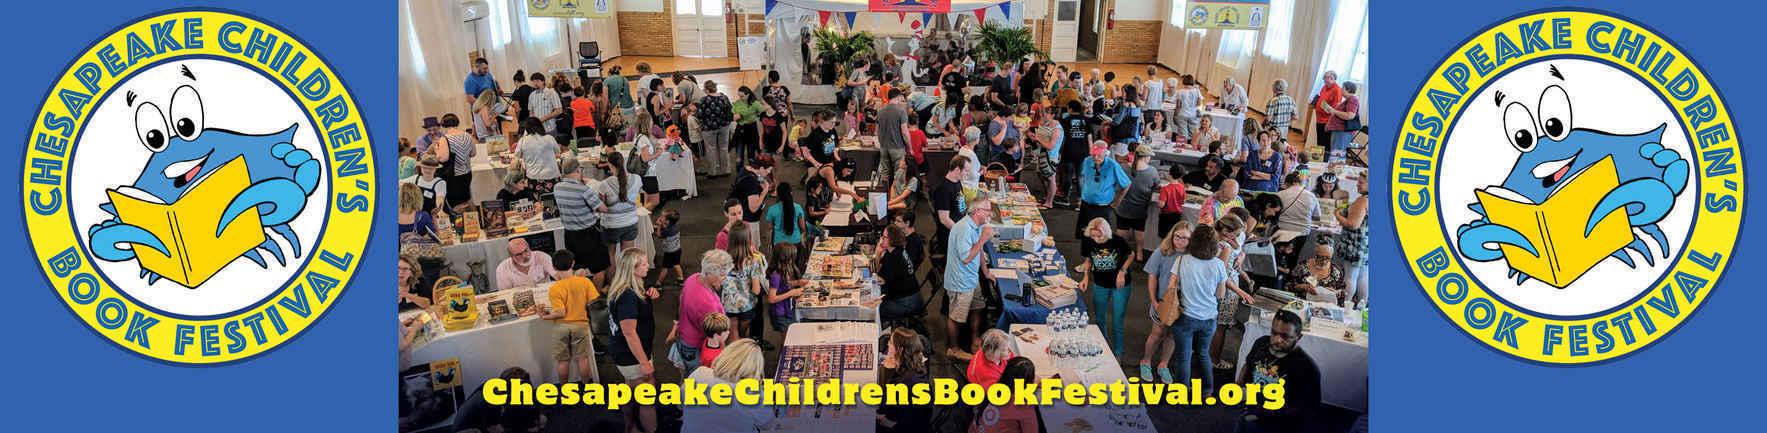 Chesapeake Children's Book Festival image